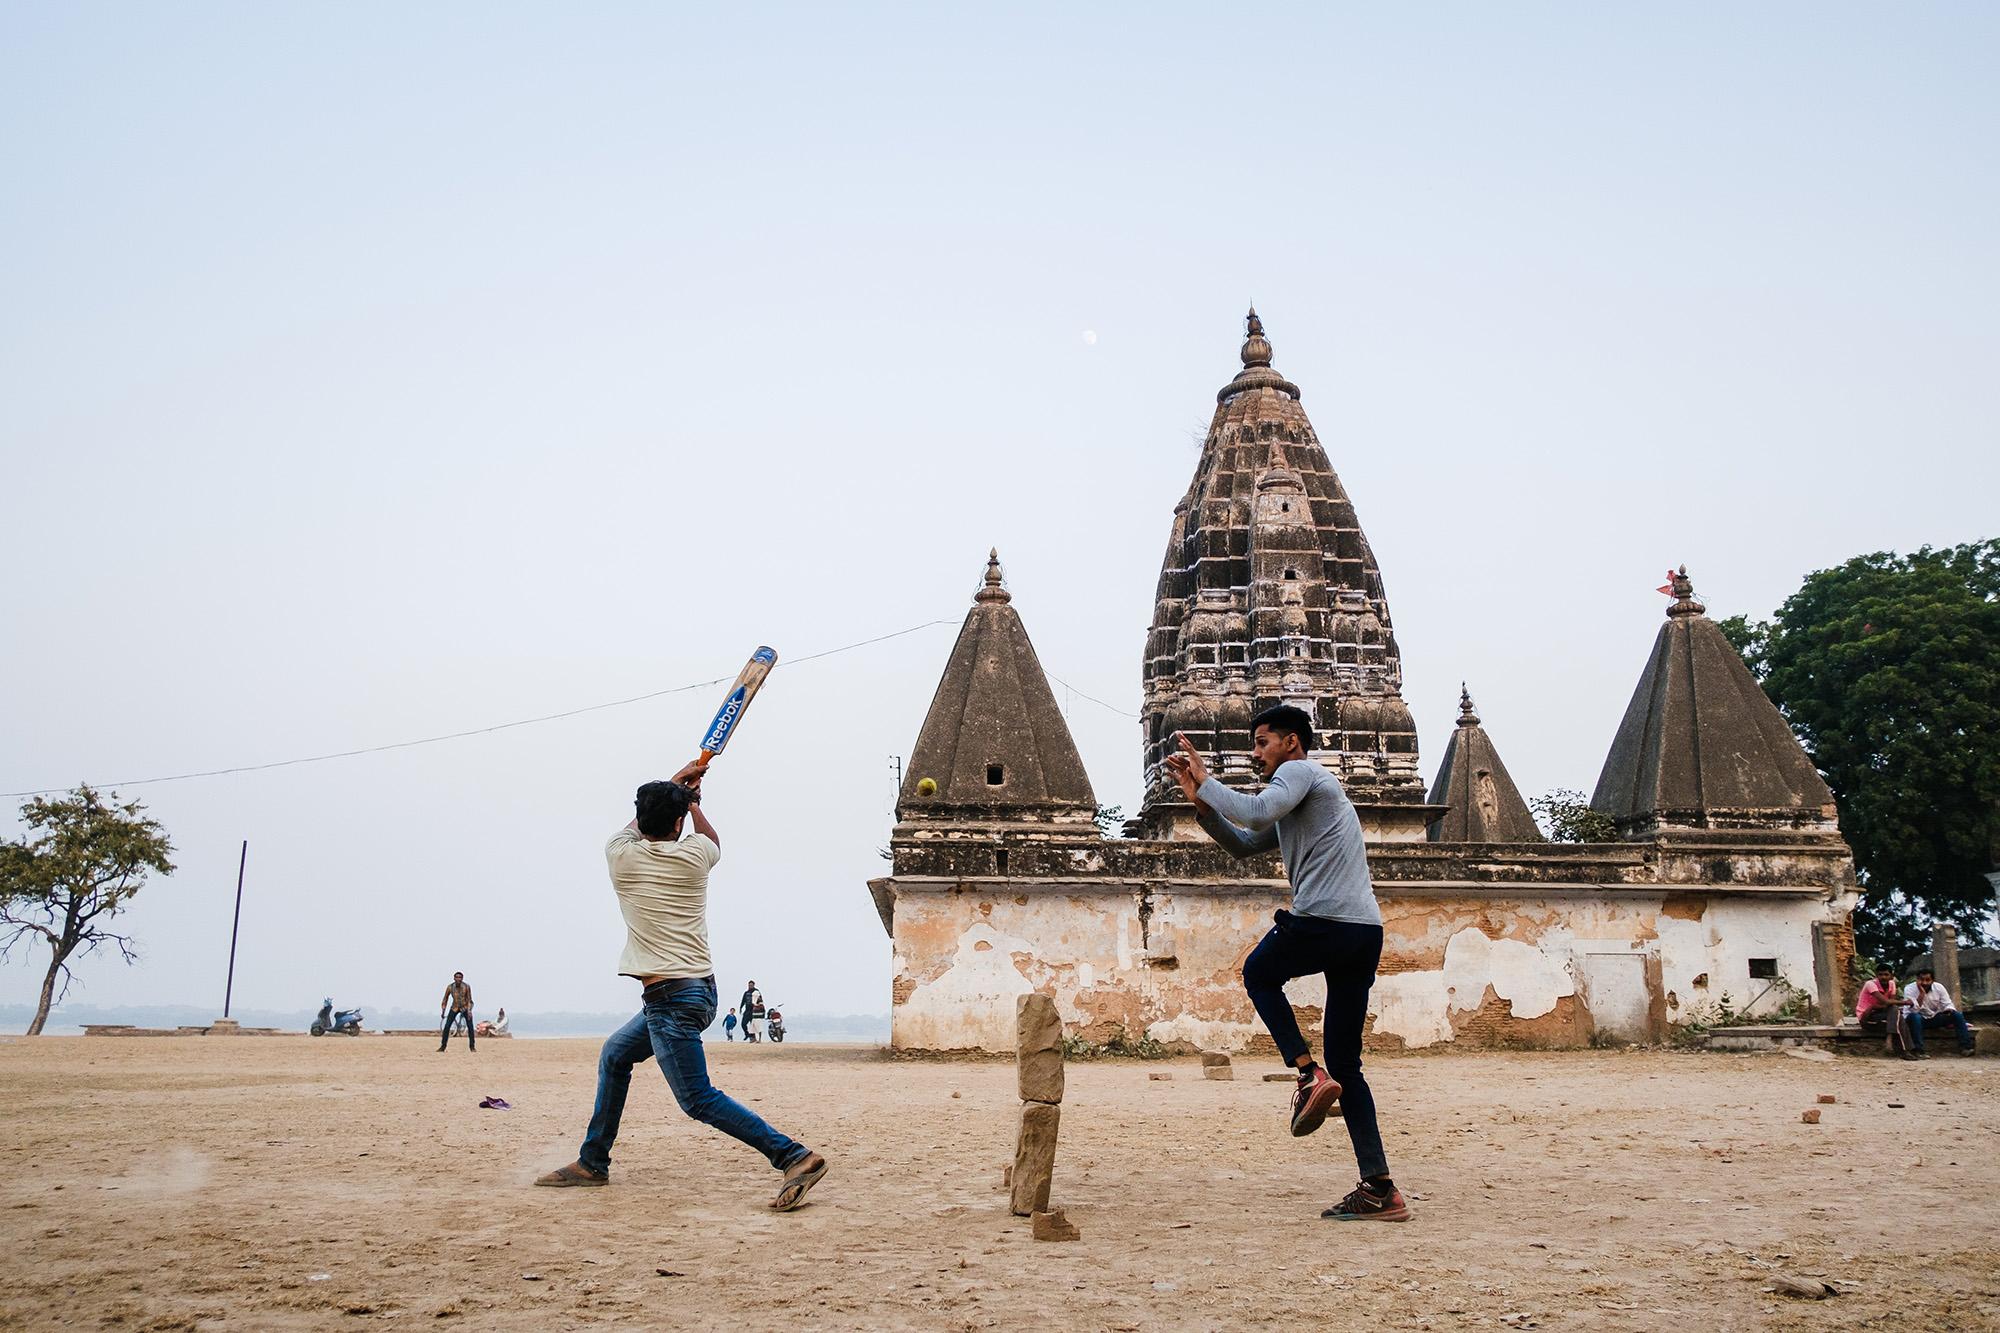 AnjaPoehlmann_India-Varanasi_126.jpg